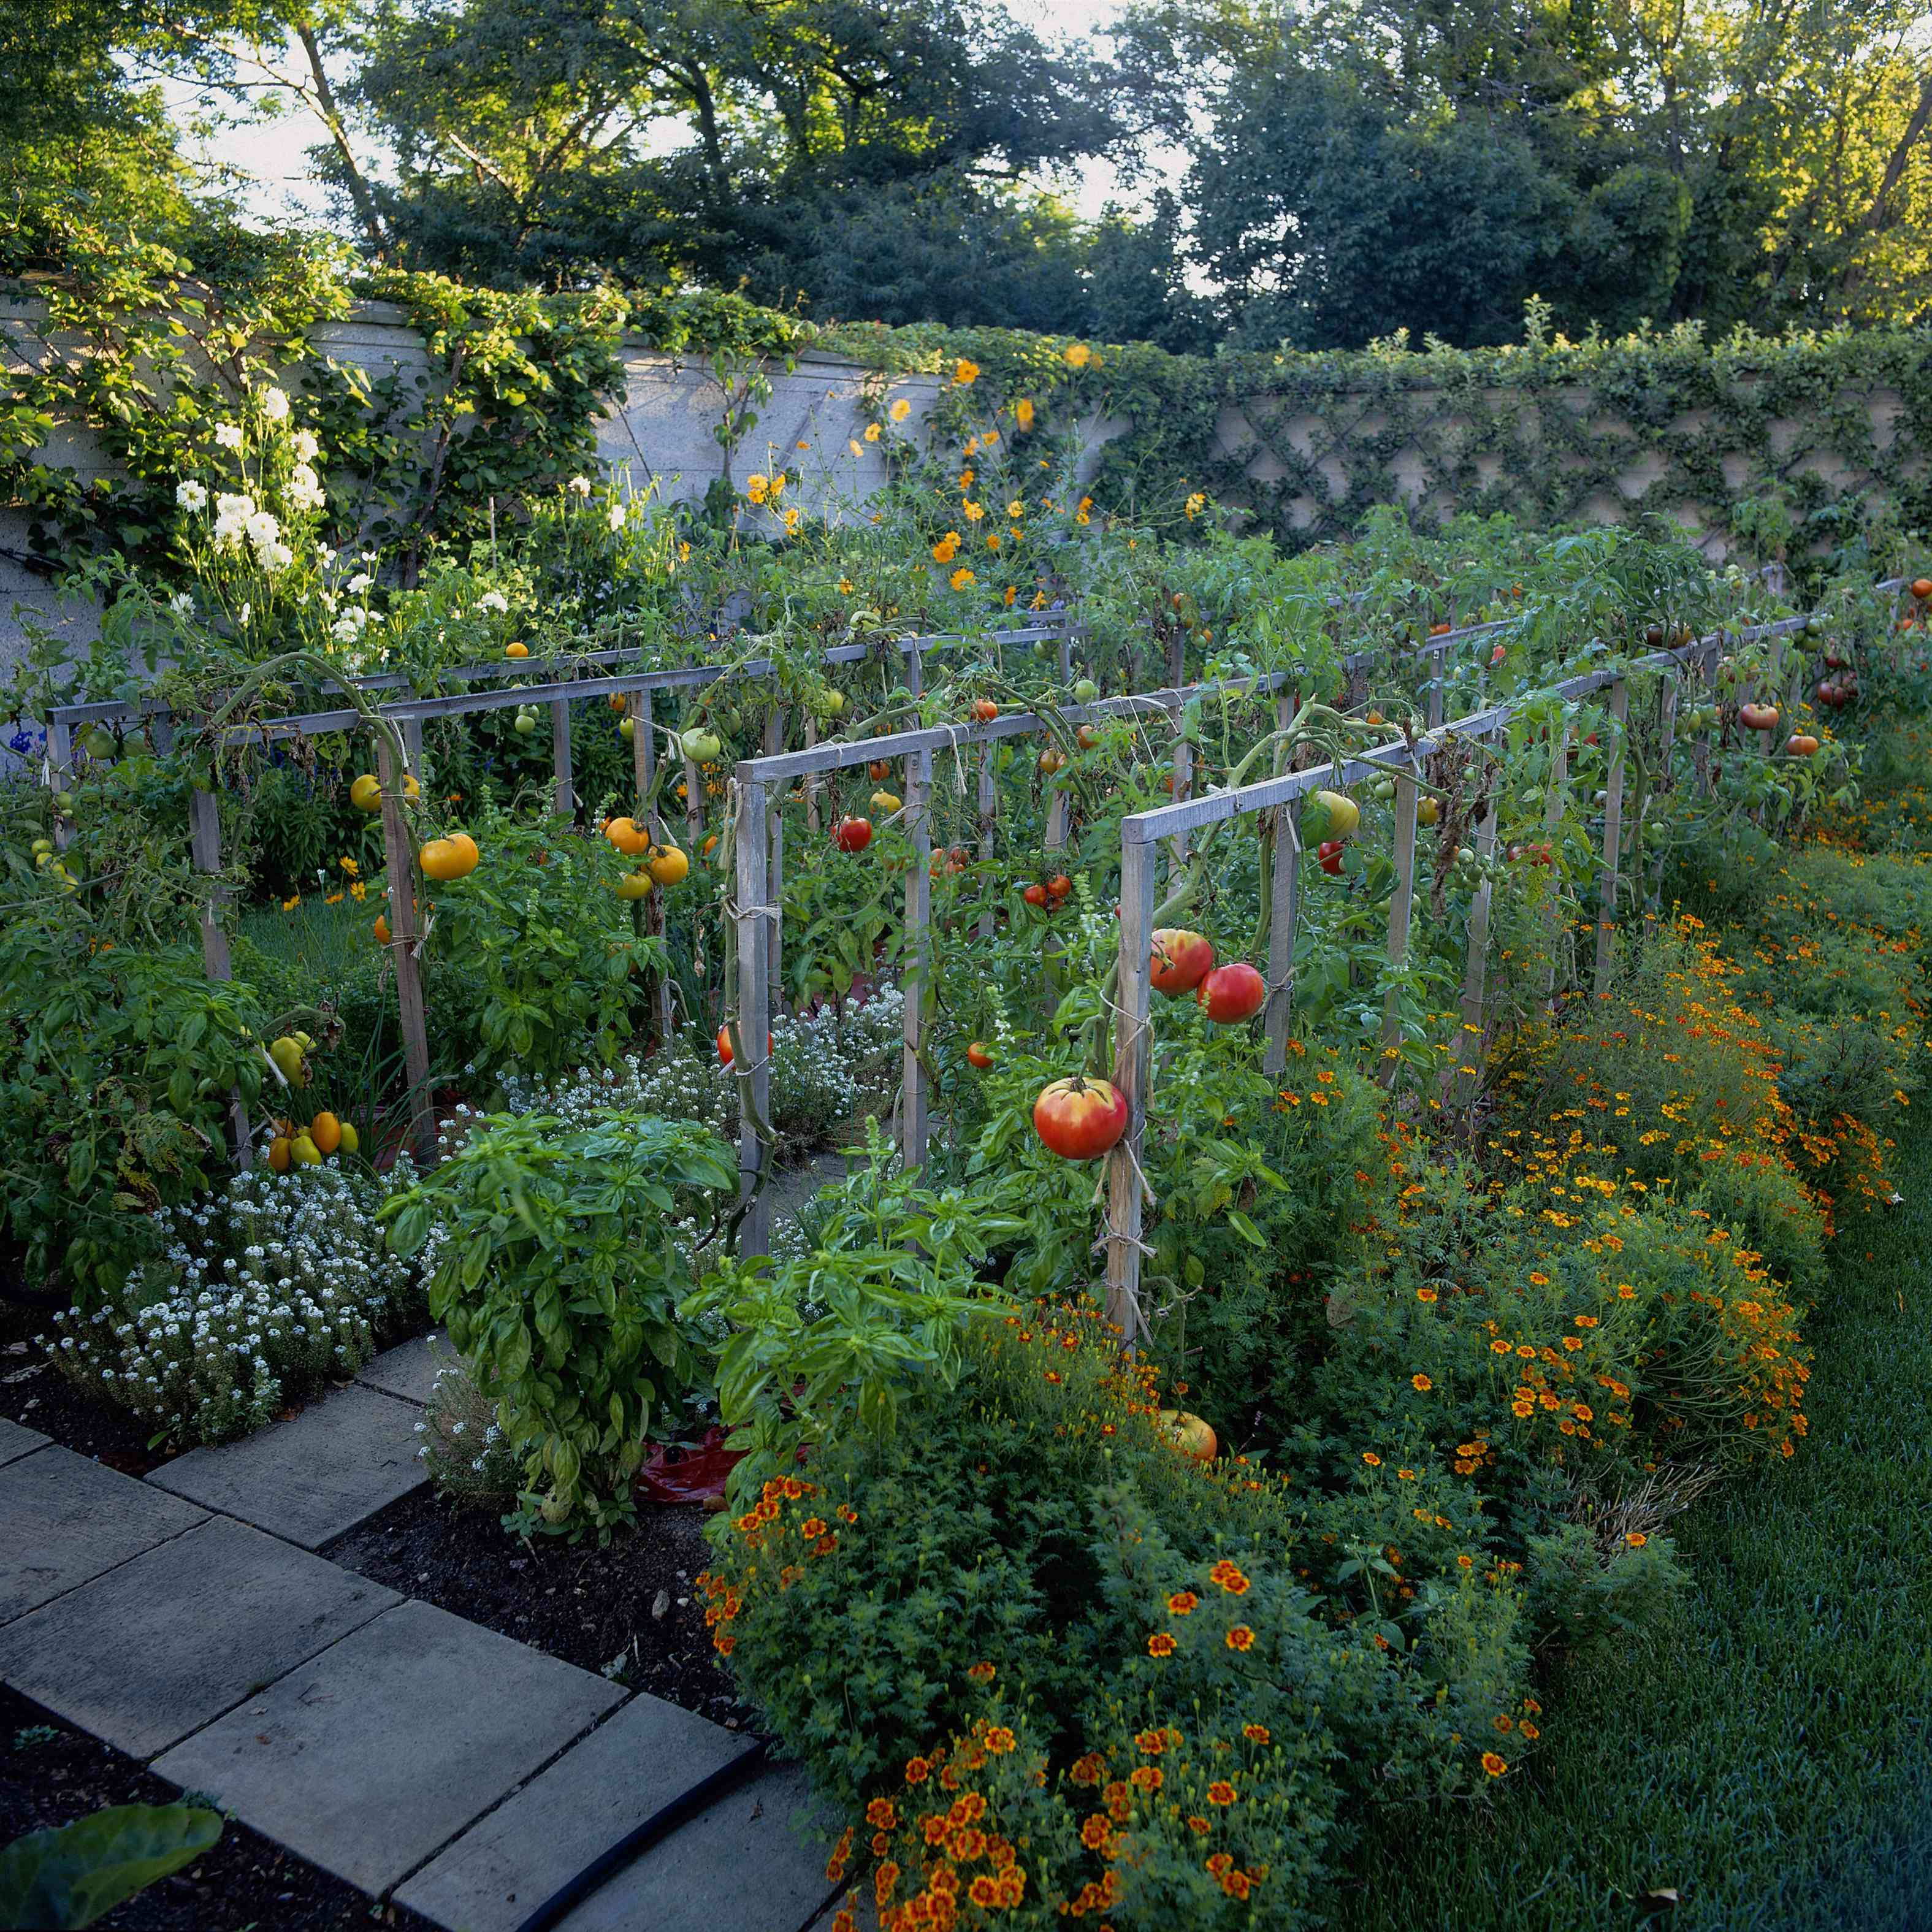 Huerta con tomates (Solanum lycopersicum) plantada con caléndula (Tagetes) y albahaca (Ocimum basilicum), Washington, CT, EE. UU.